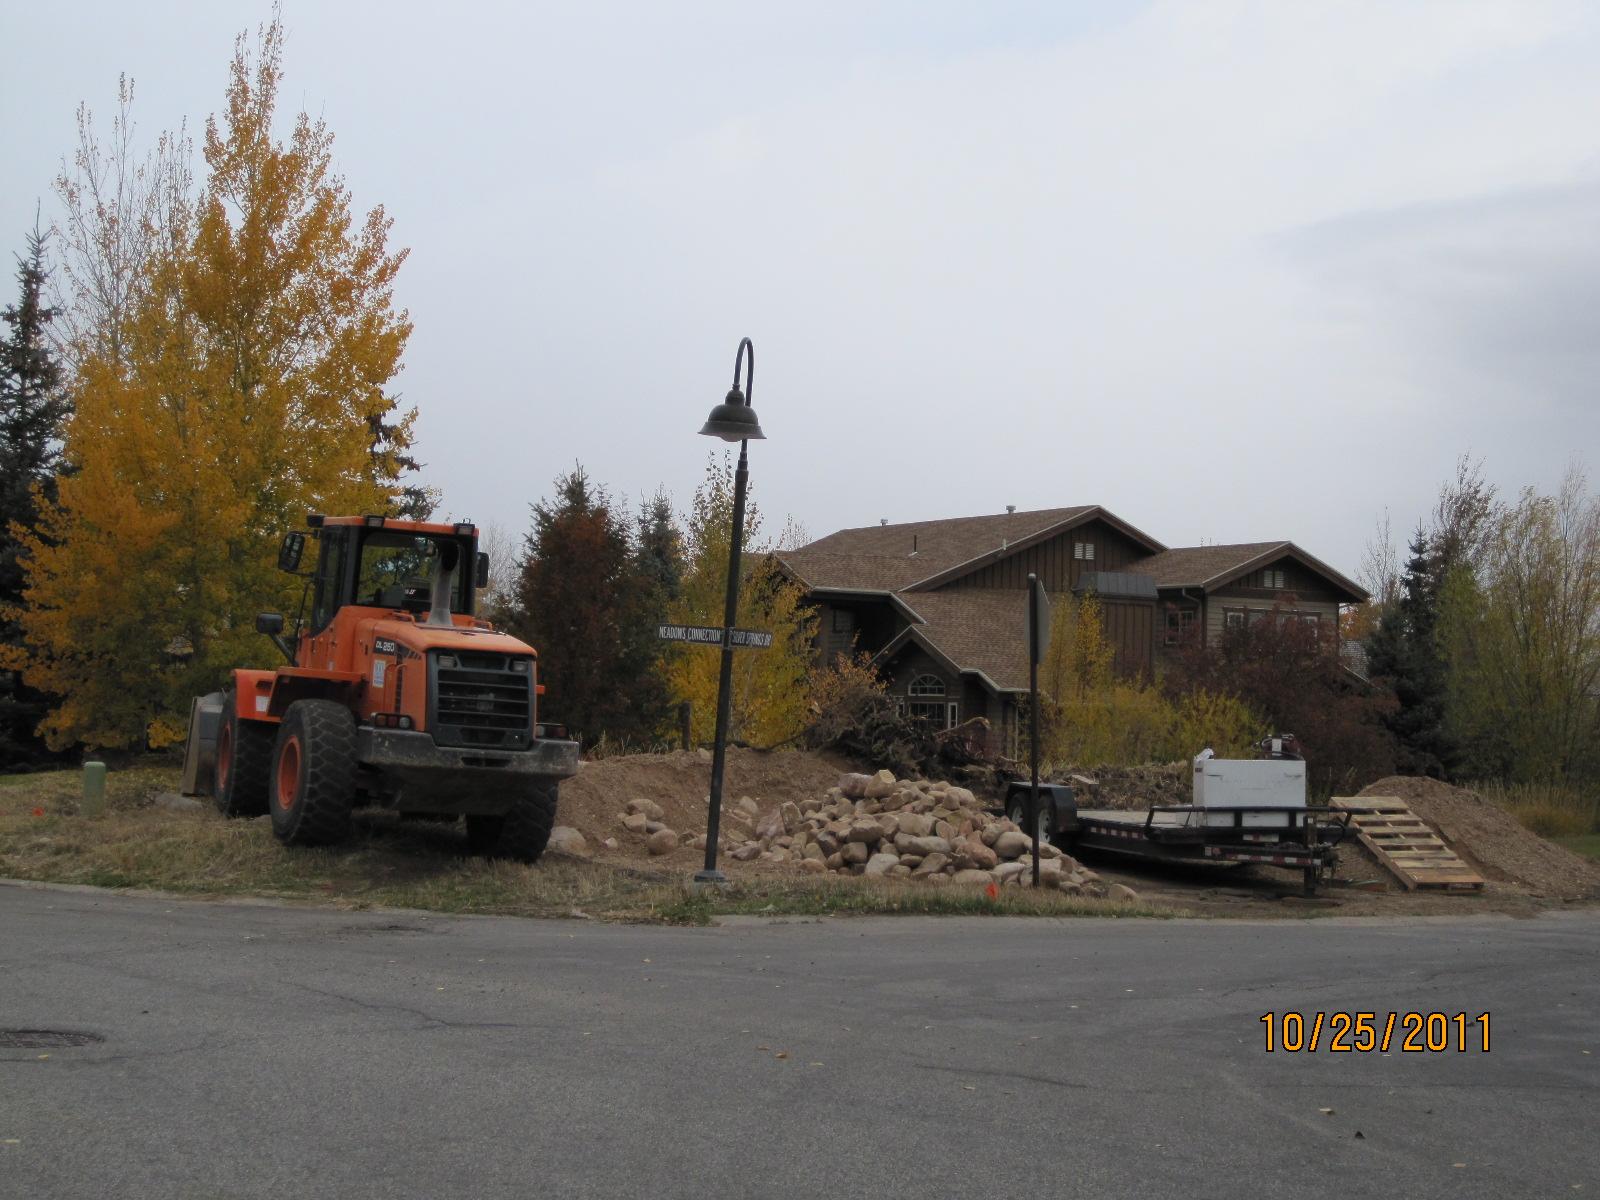 IMG_2080-tractor-rockpile